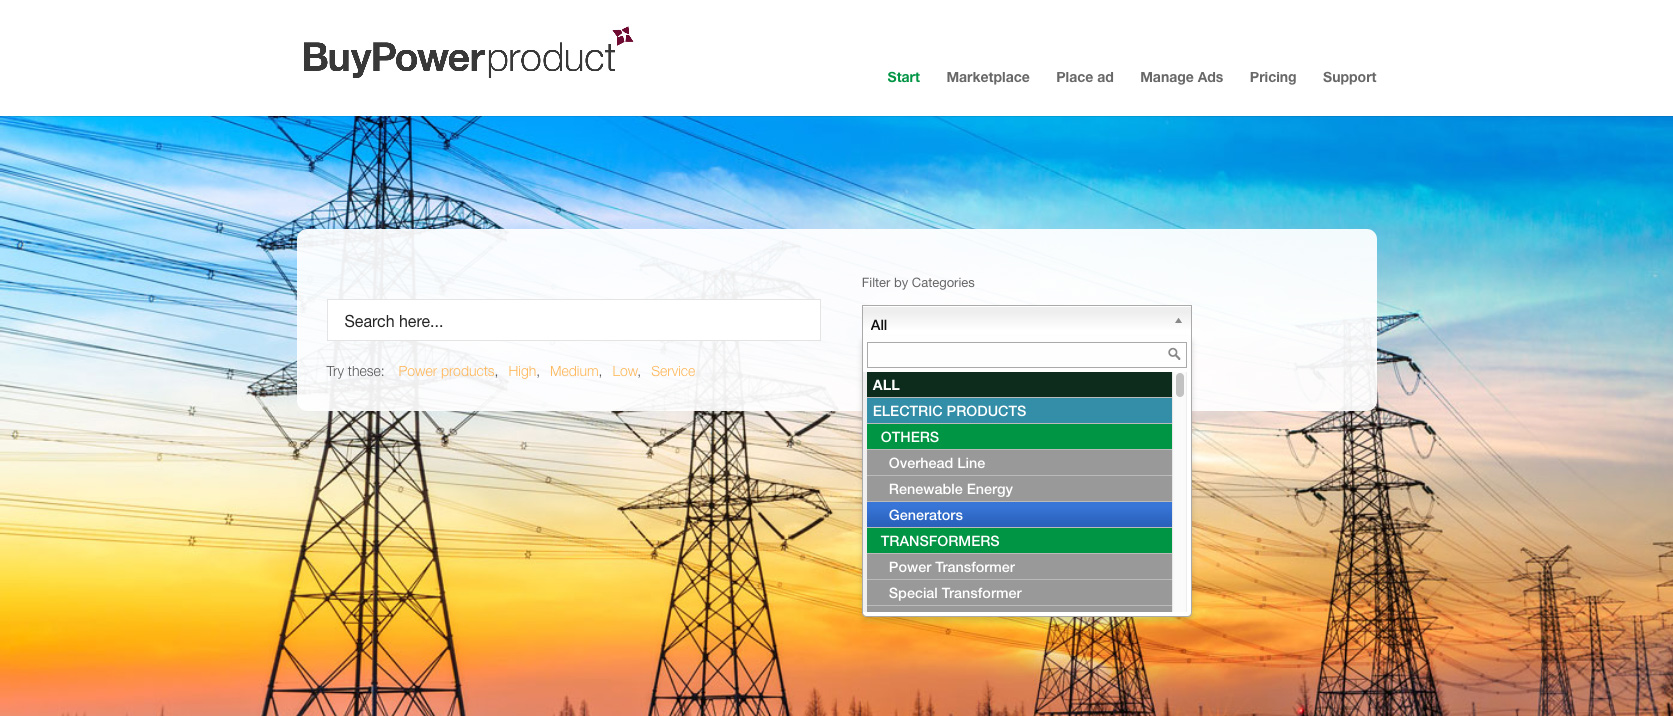 buypowerproducts - top